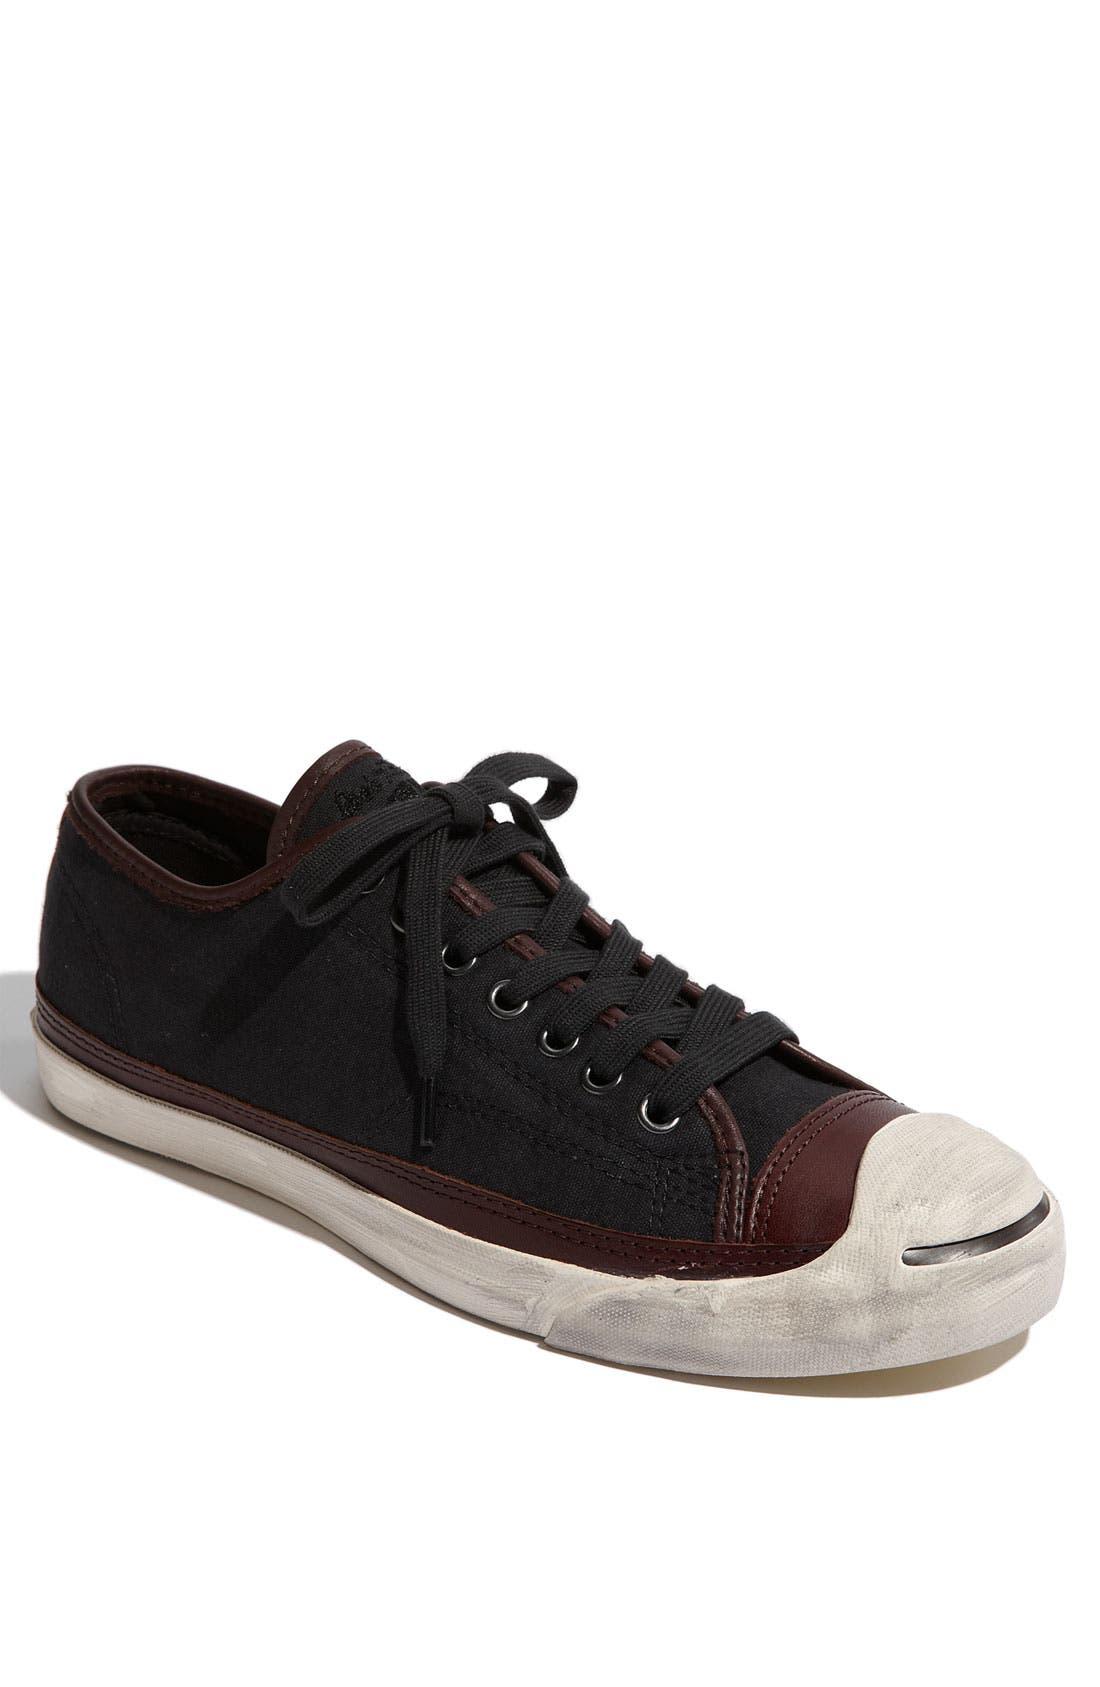 Main Image - Converse by John Varvatos 'Jack Purcell Vintage' Sneaker (Men)